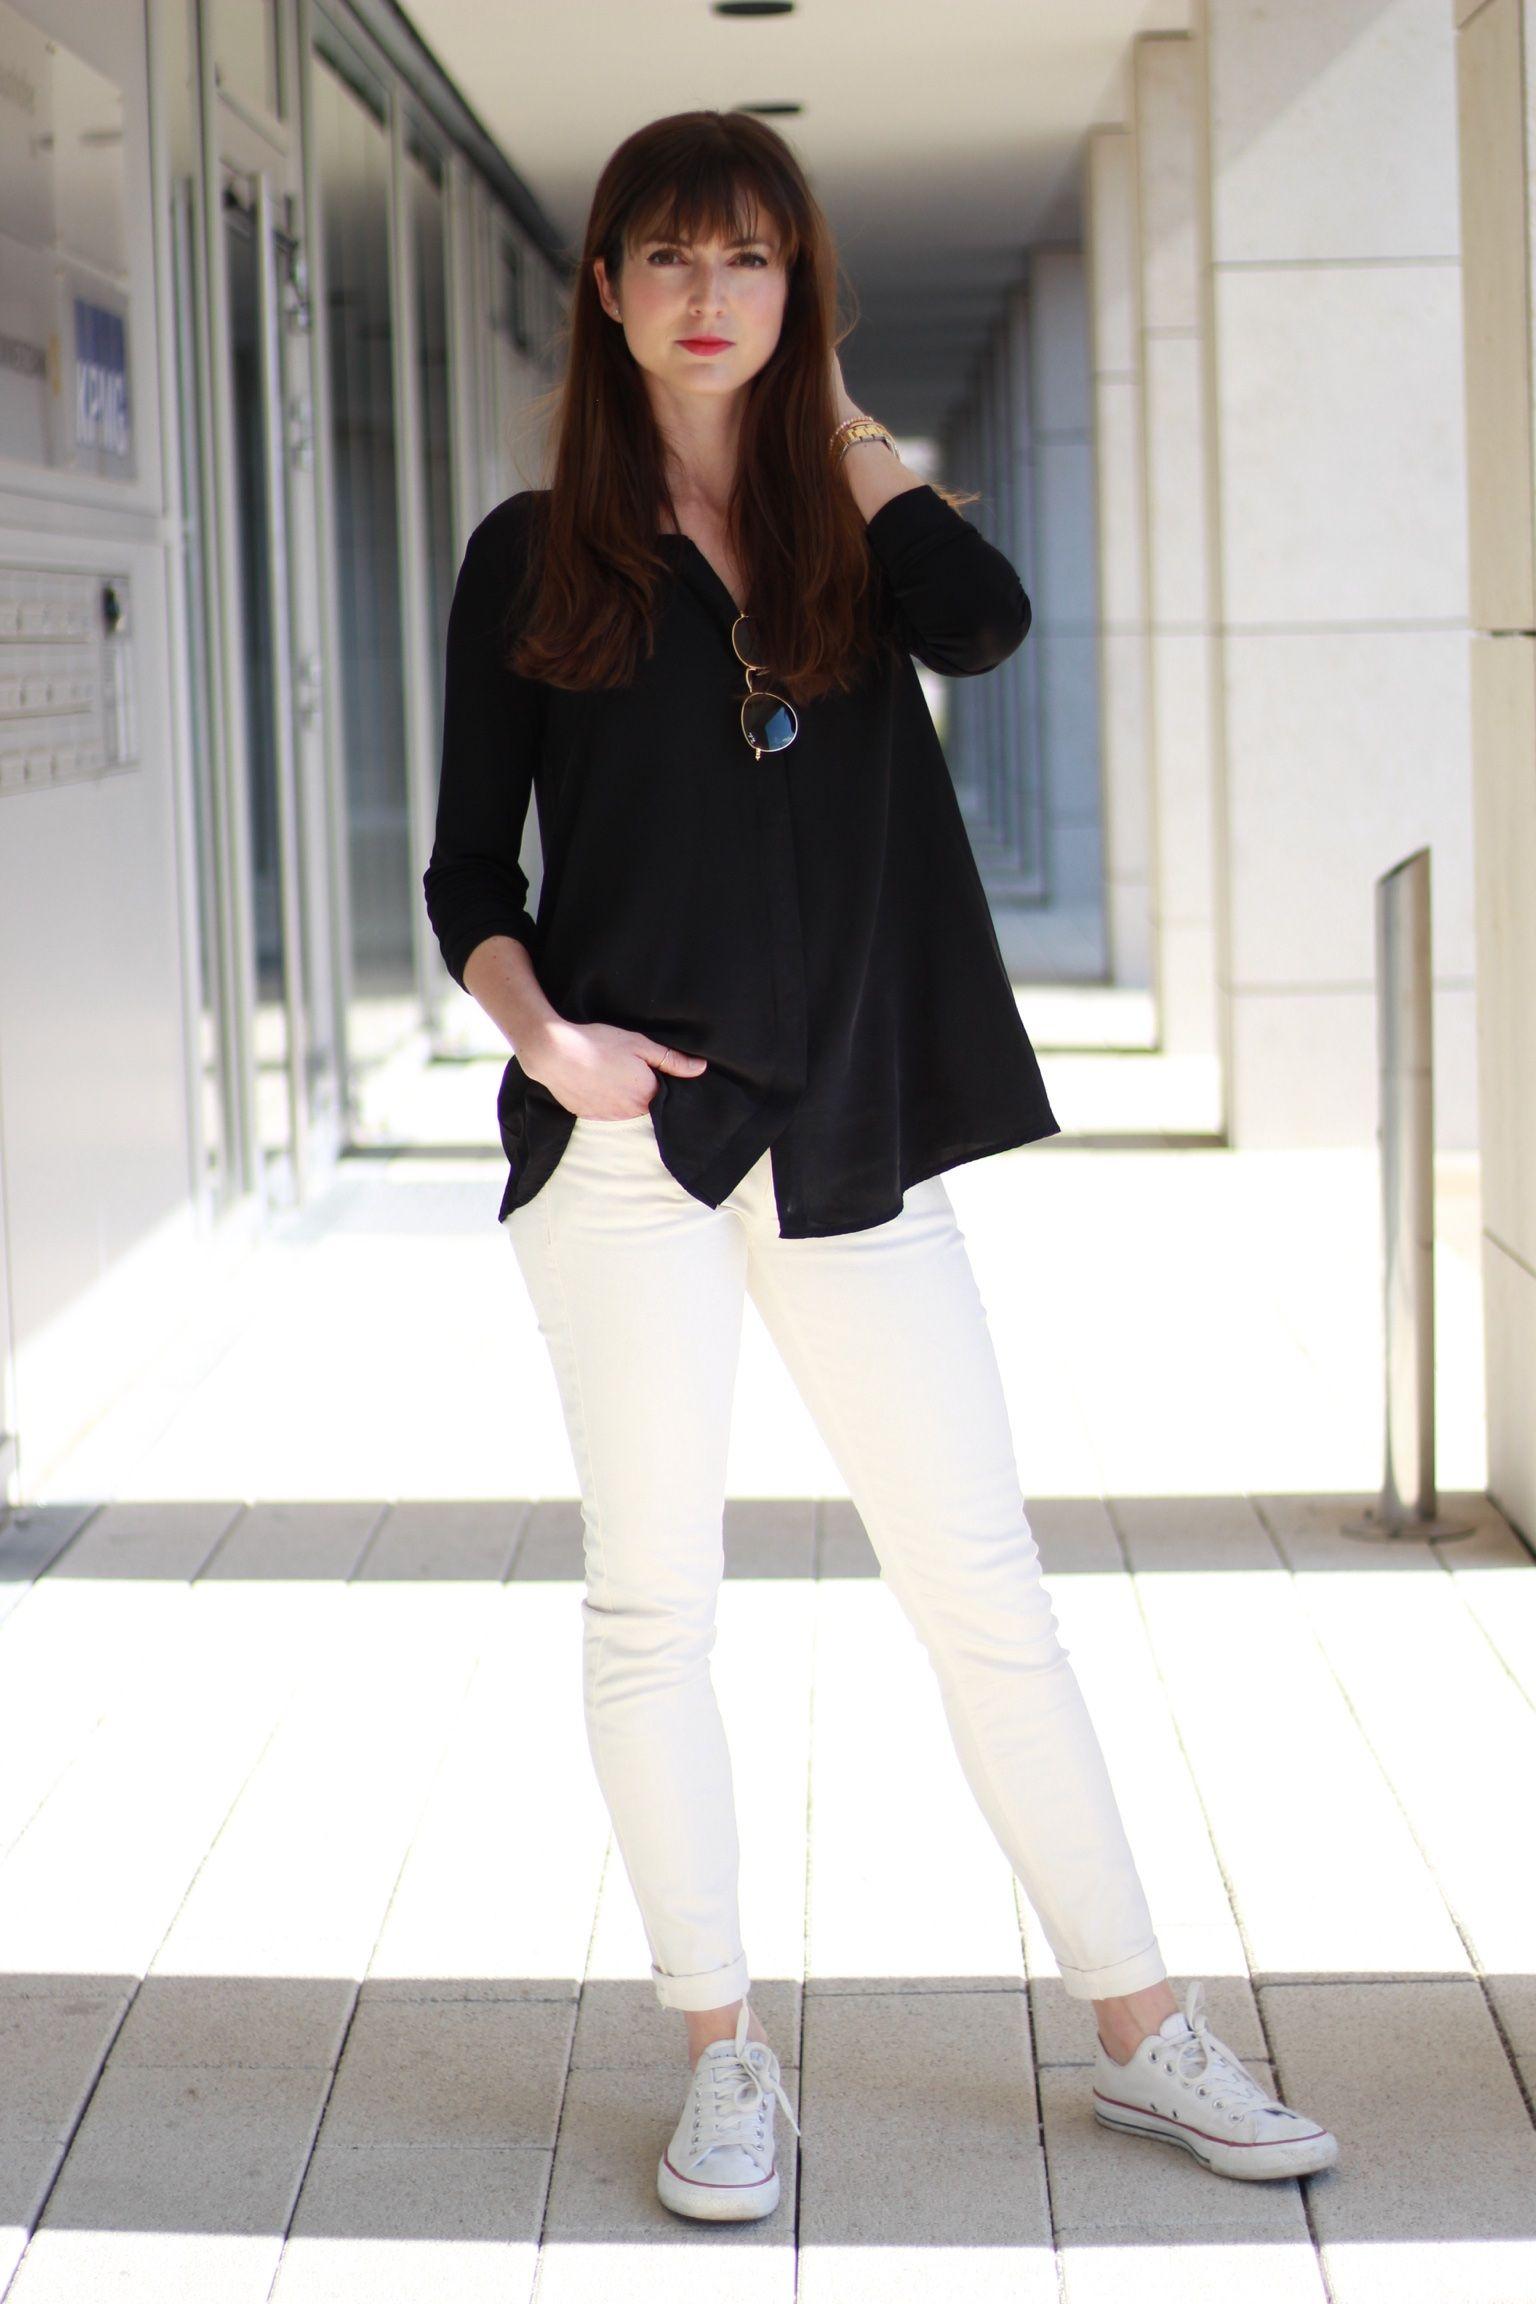 Maßangefertigte-Jeans-Selfnation-Maßjeans-Fashion-Blog-Freiburg-Trends-2016